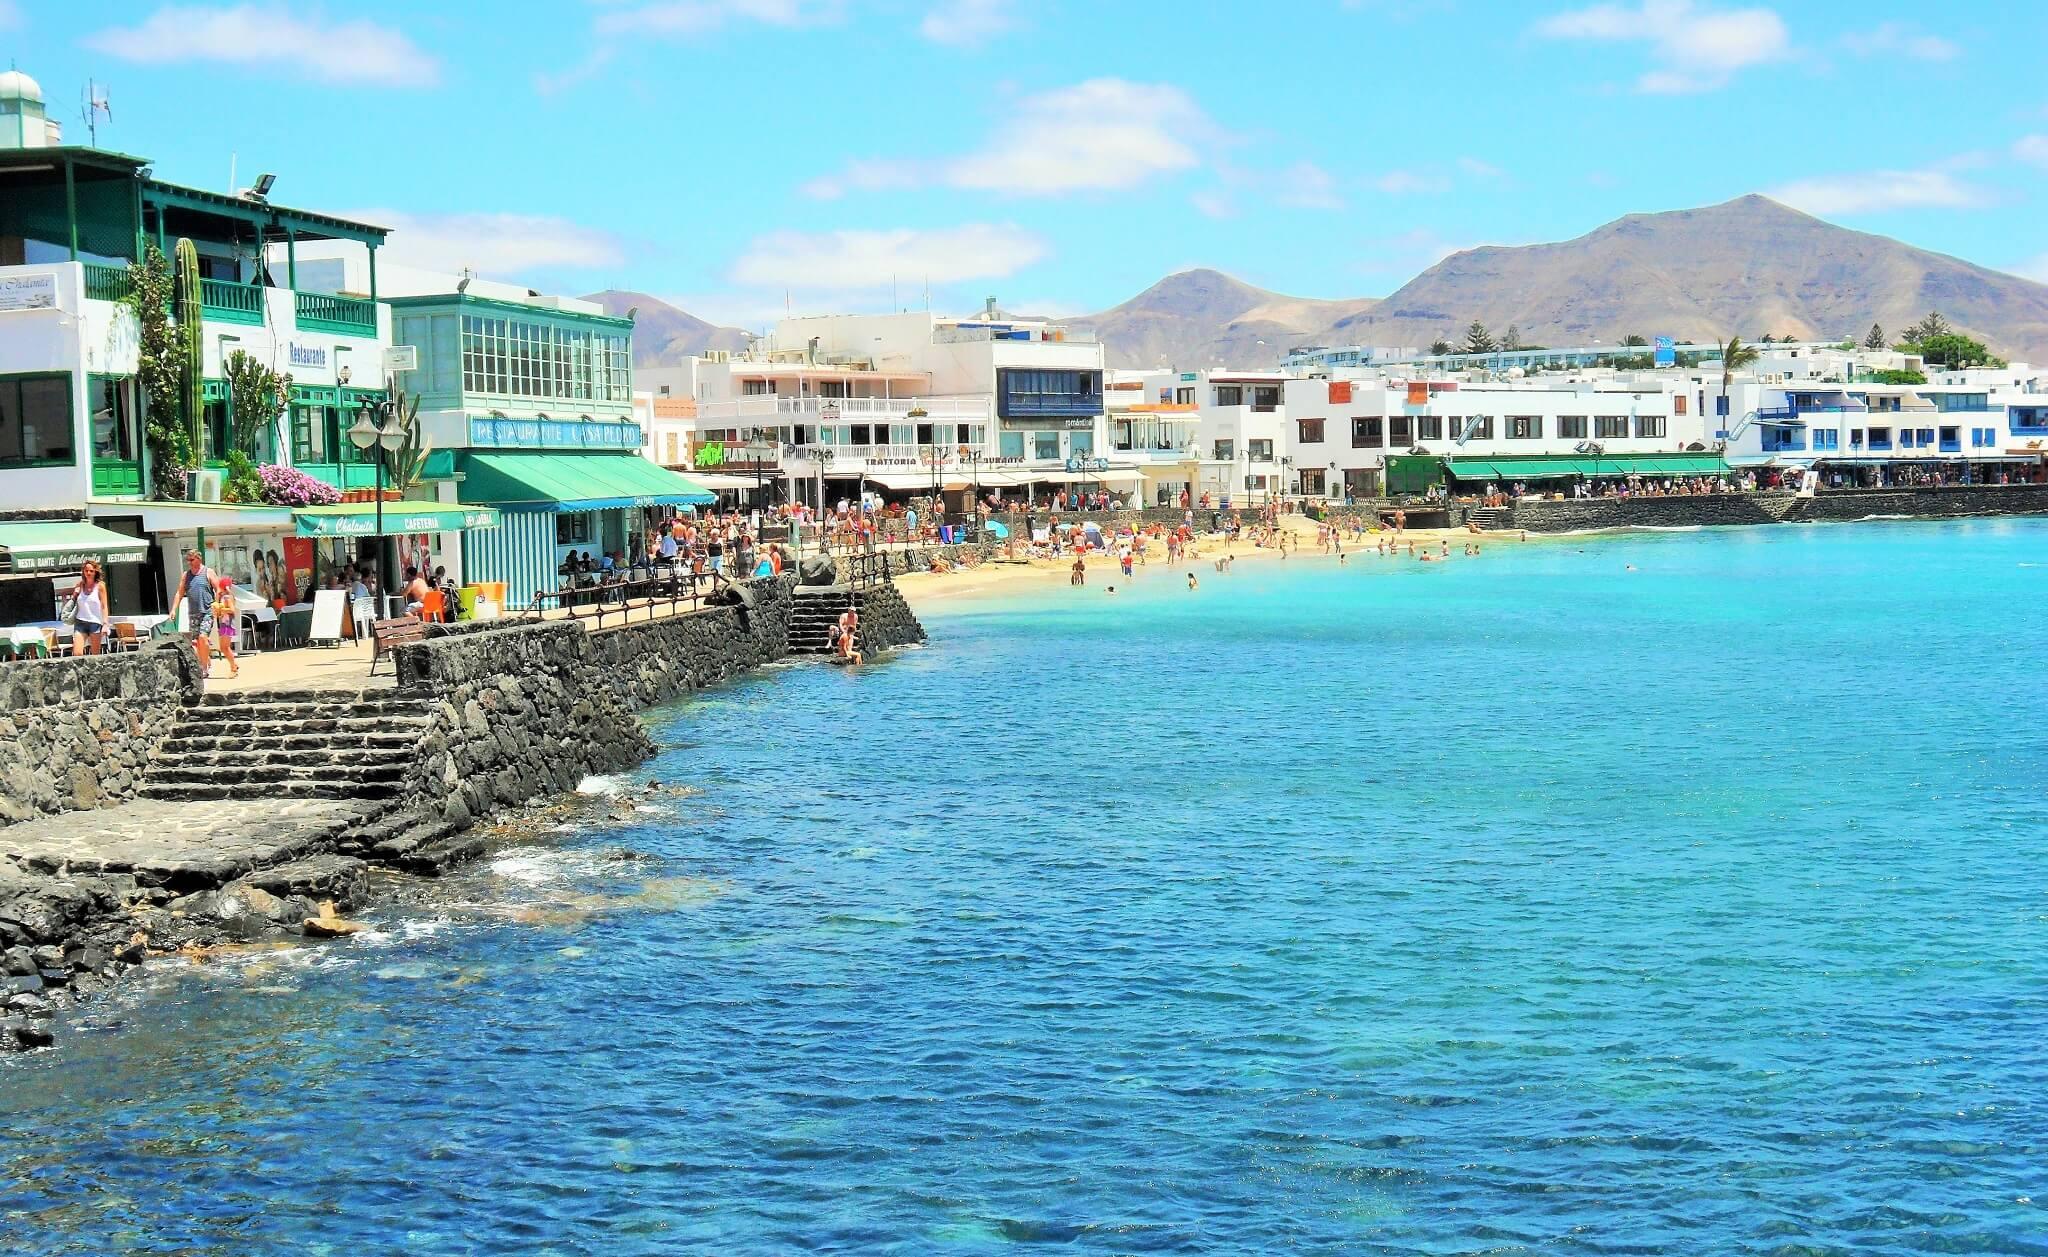 Playa Blanca, Lanzarote. Fotografía de Ramón Pérez Niz.